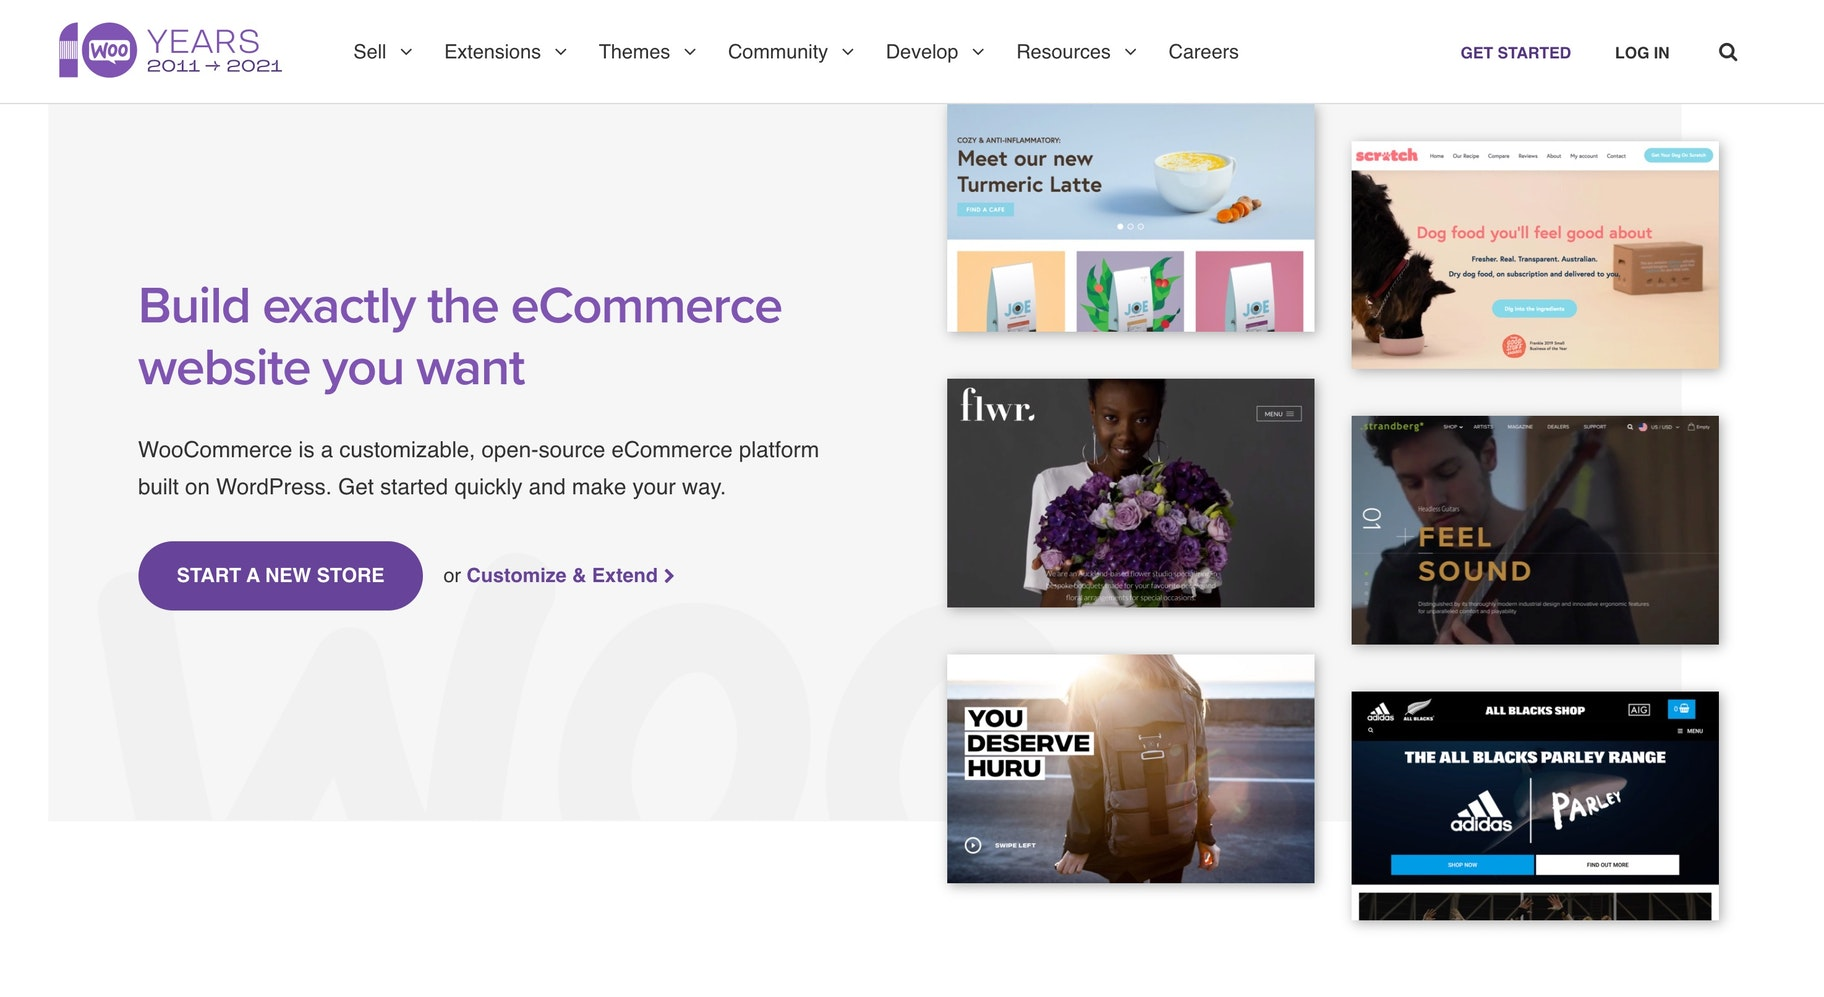 WordPress online store builder WooCommerce